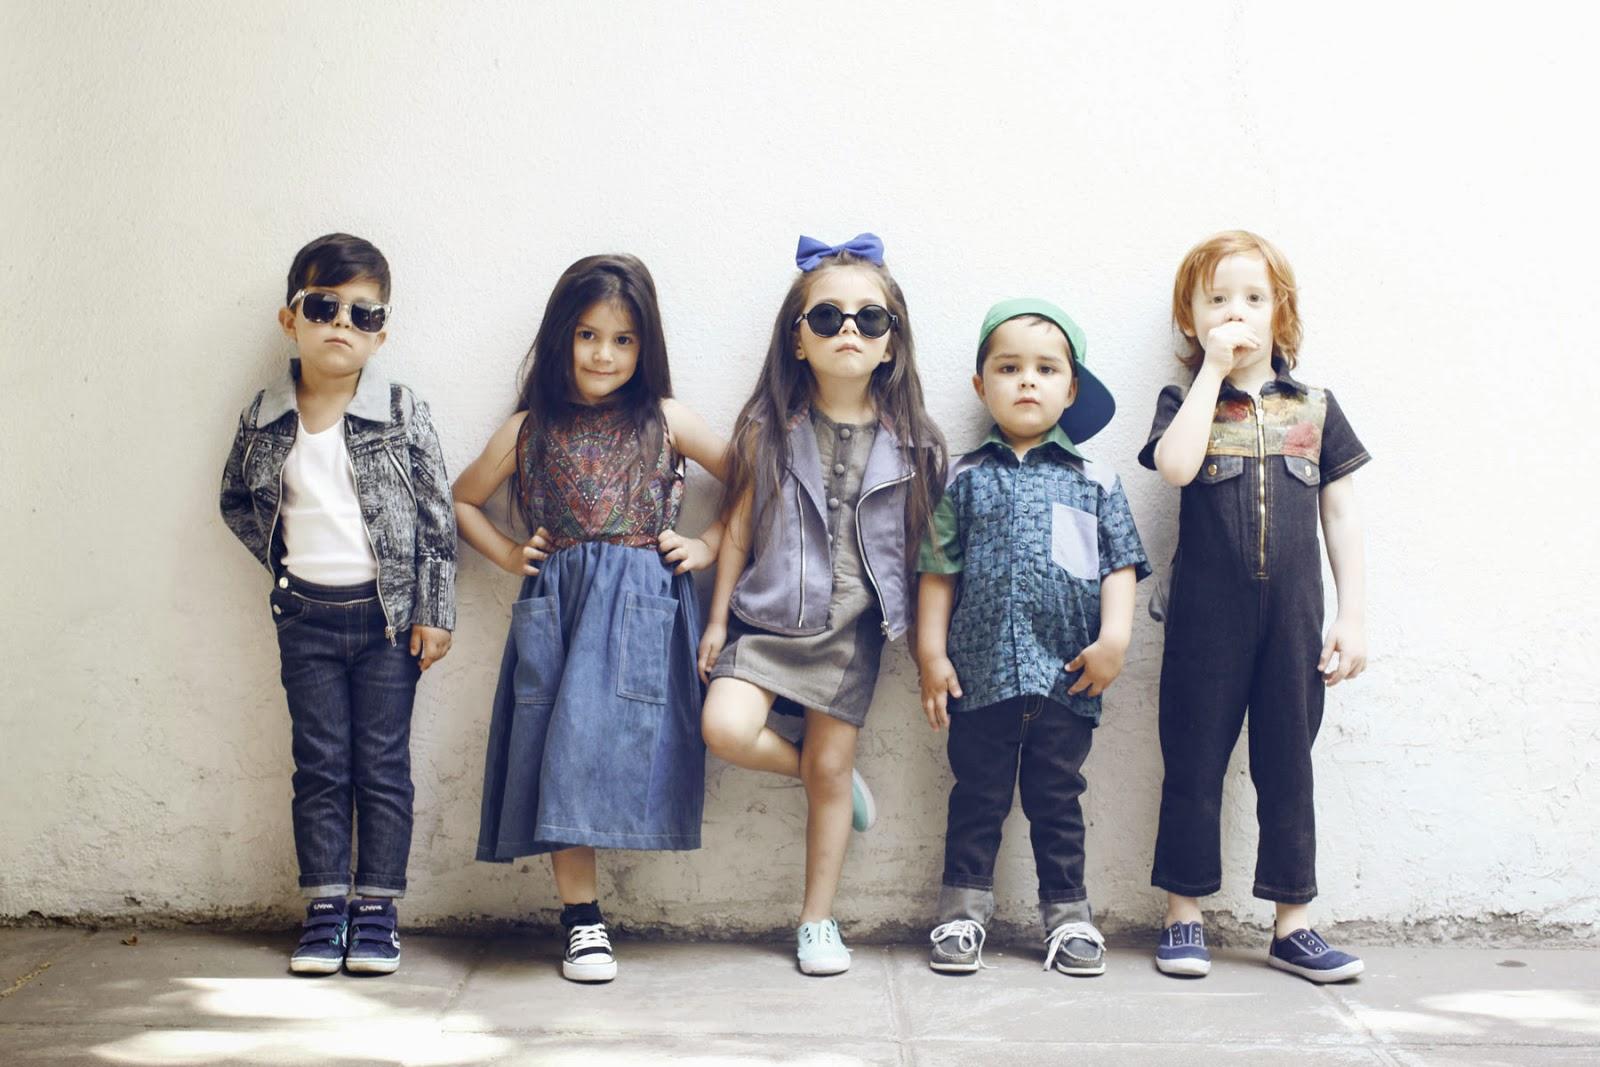 Mon moda infantil que se la juega por la reutilizaci n quinta trends - Monalisa moda infantil ...